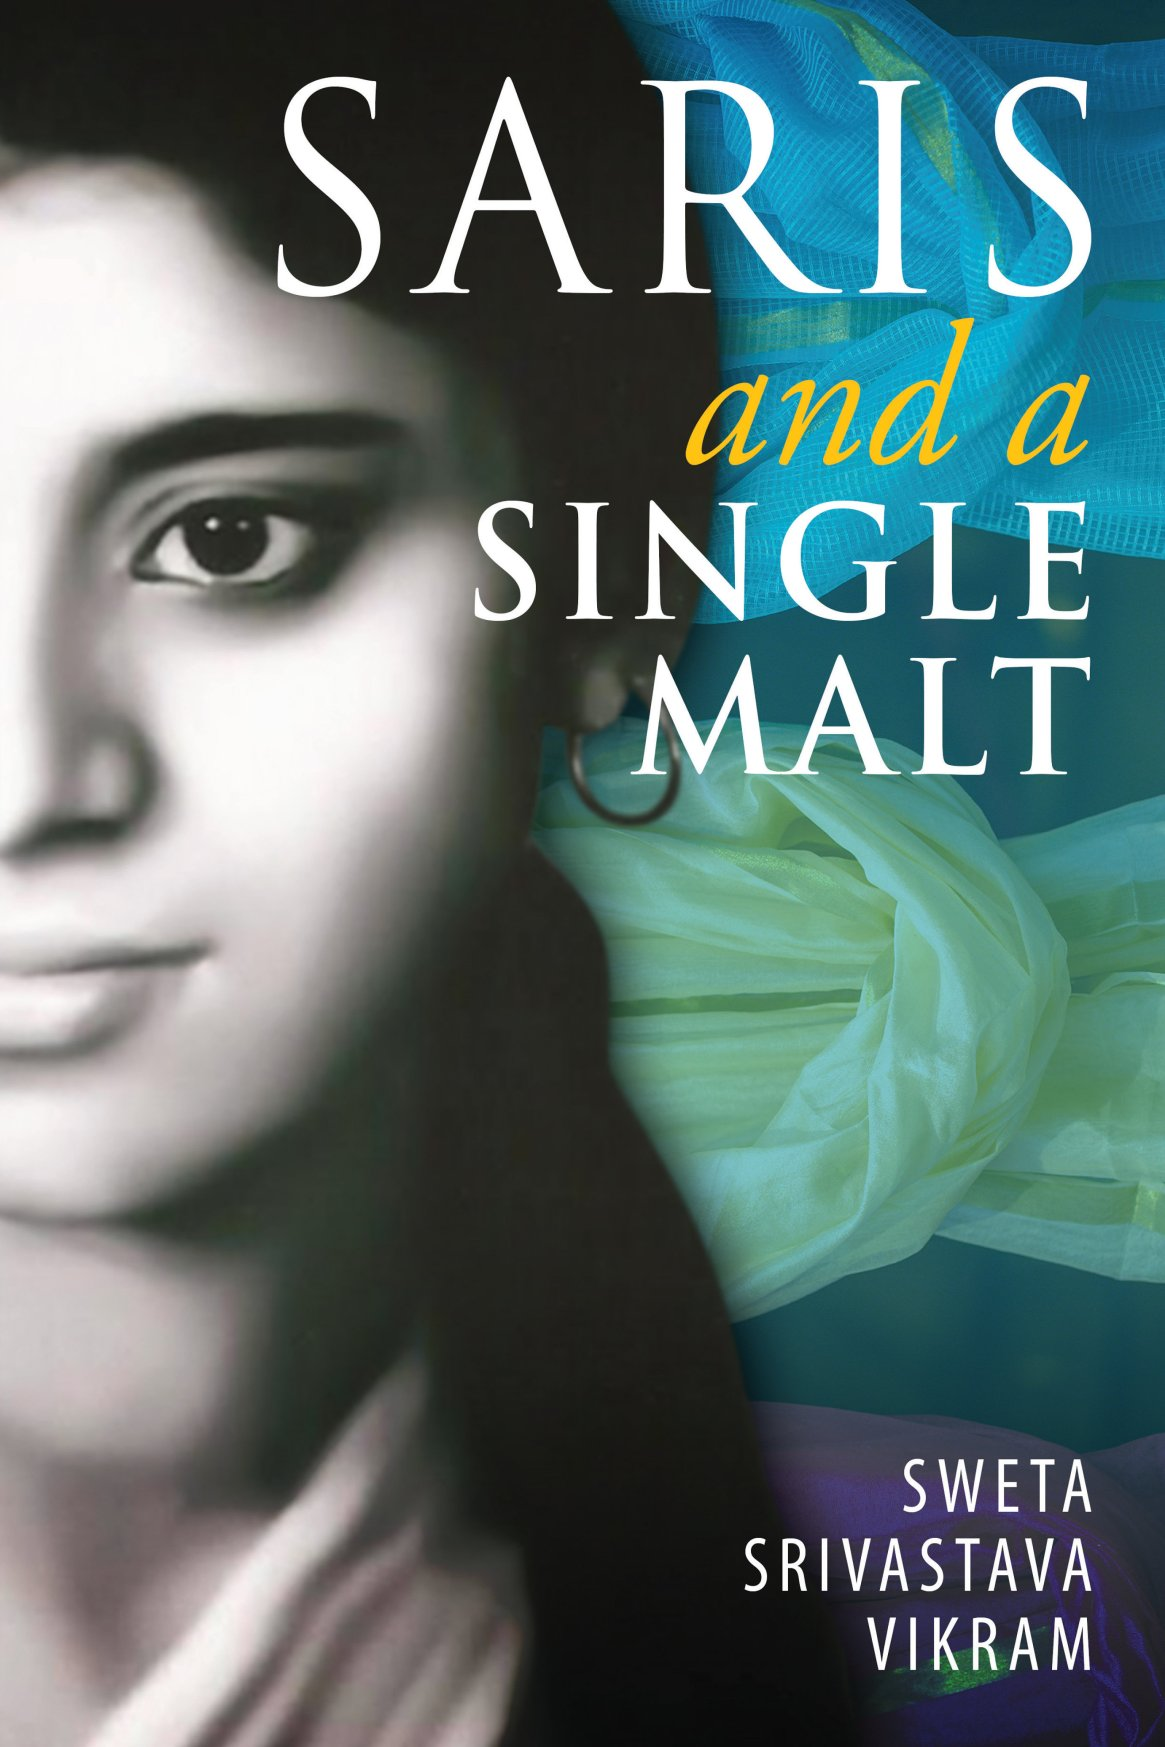 Saris and a Single Malt 978-1-61599-294-2